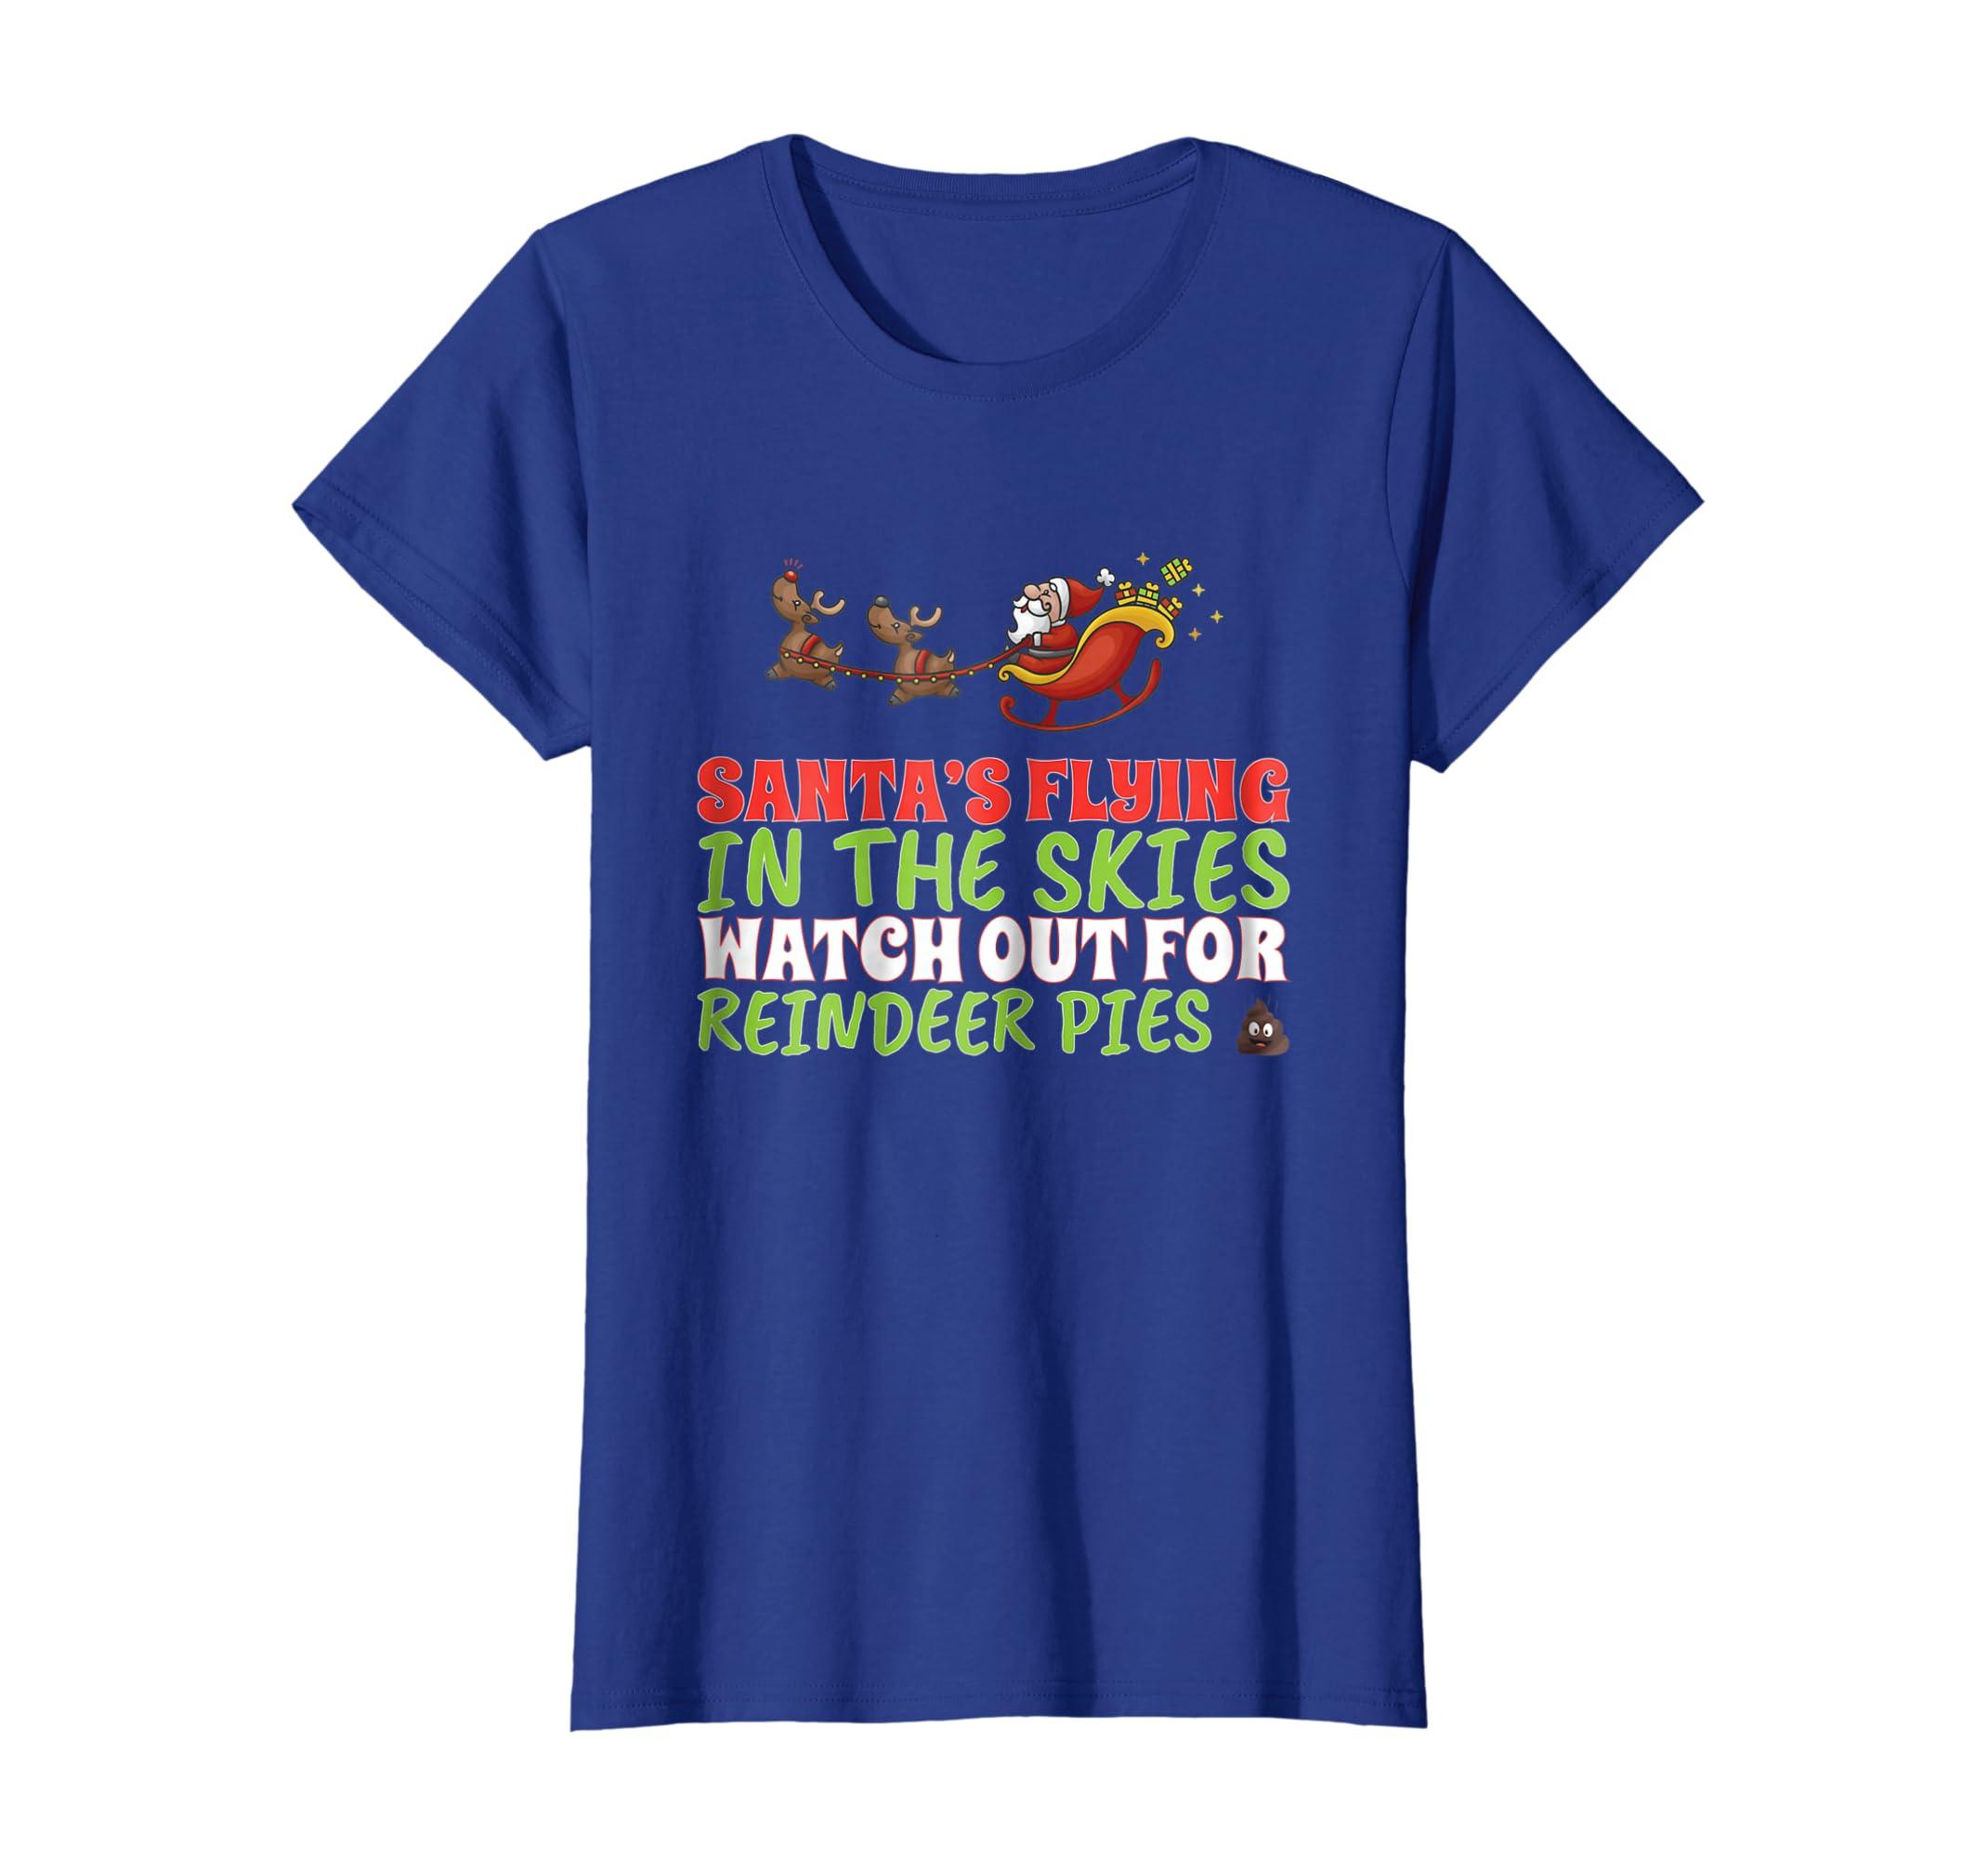 5655f73a Amazon.com: Holiday T Shirts Slogans Sarcastic Christmas Eve T-Shirt:  Clothing